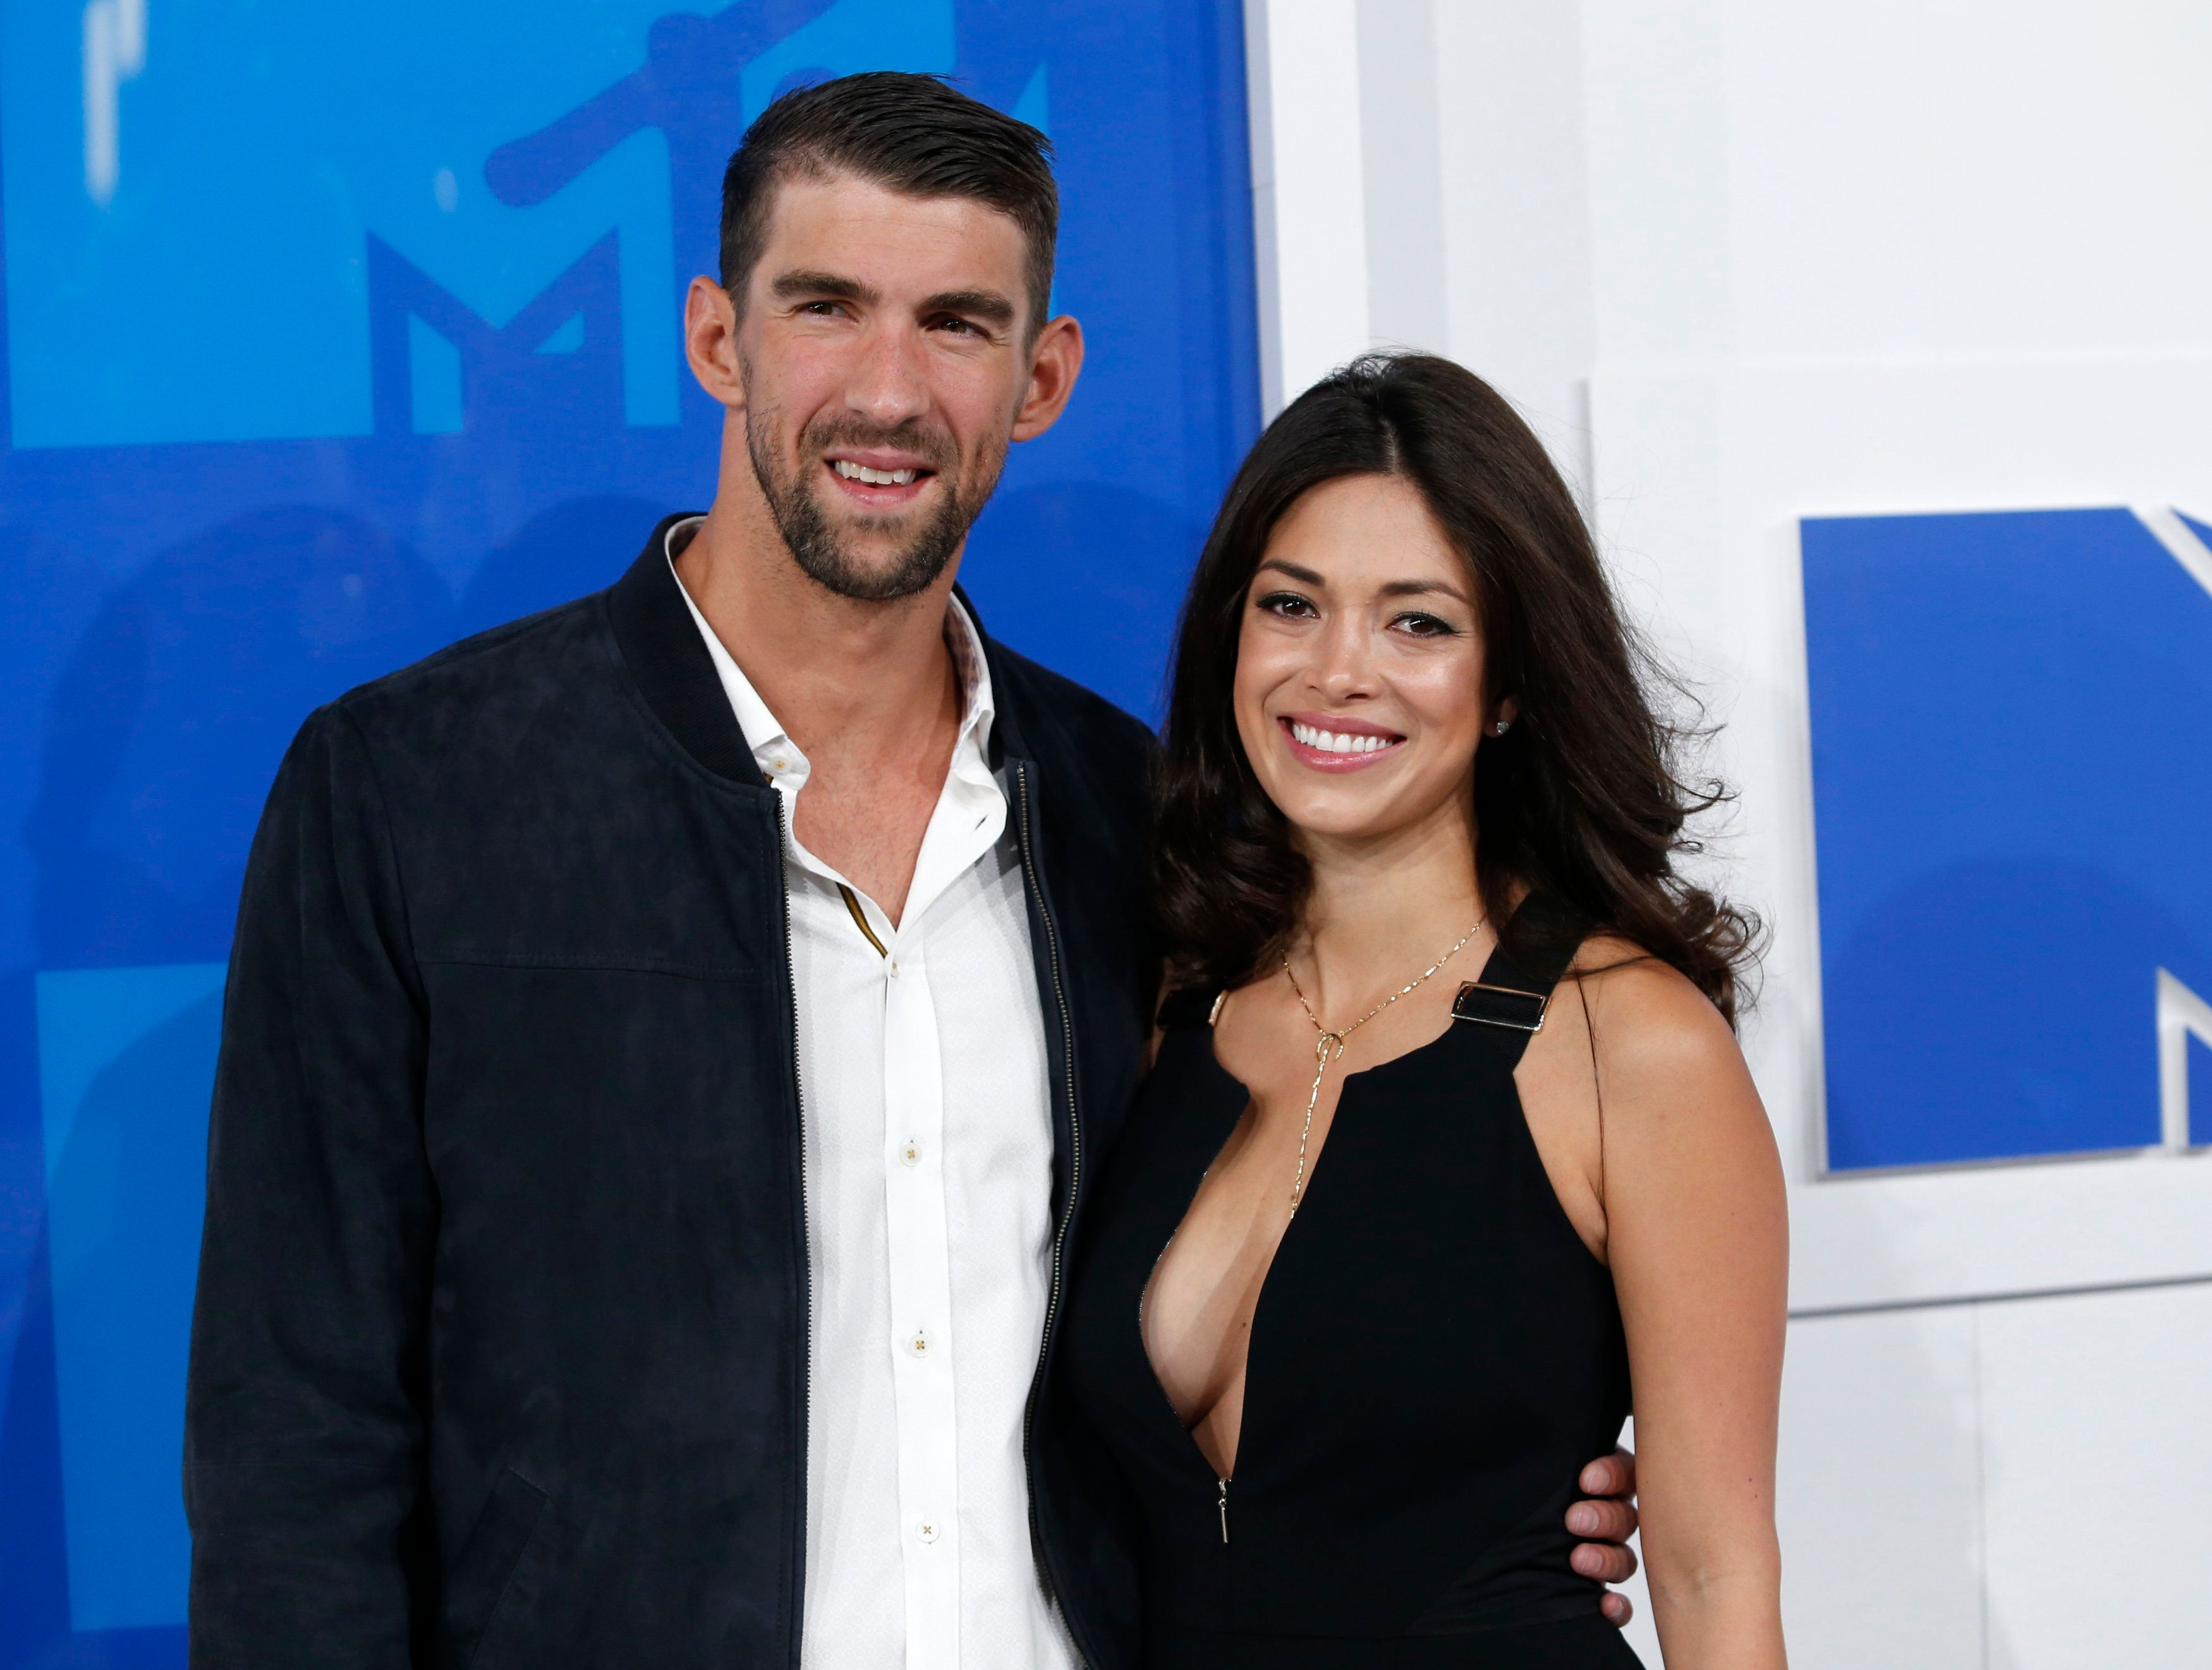 Michael Phelps Reveals Secret Mexico Wedding In Instagram